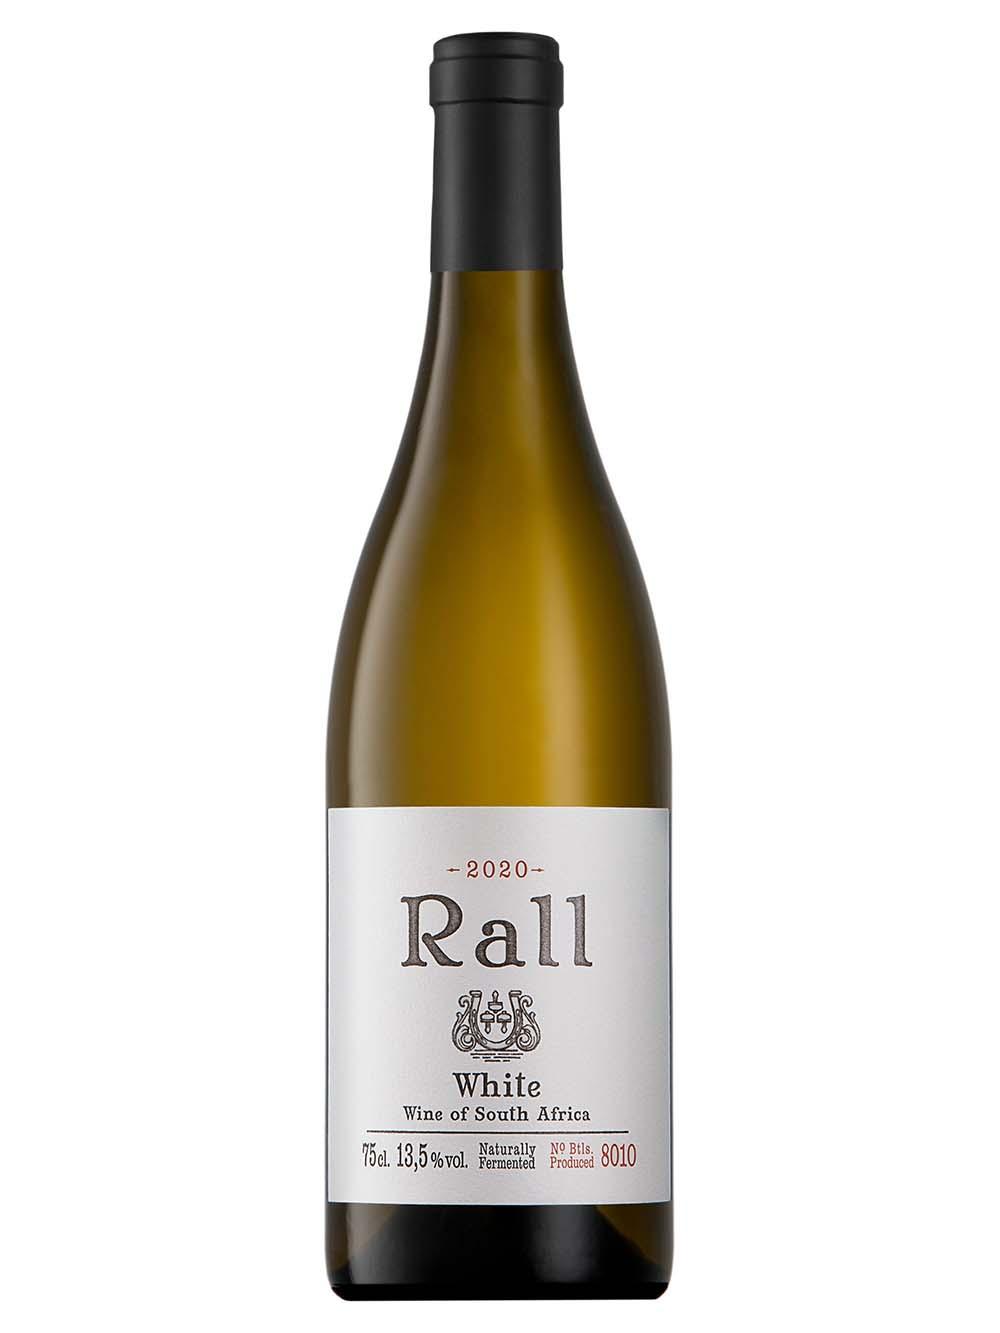 Rall White